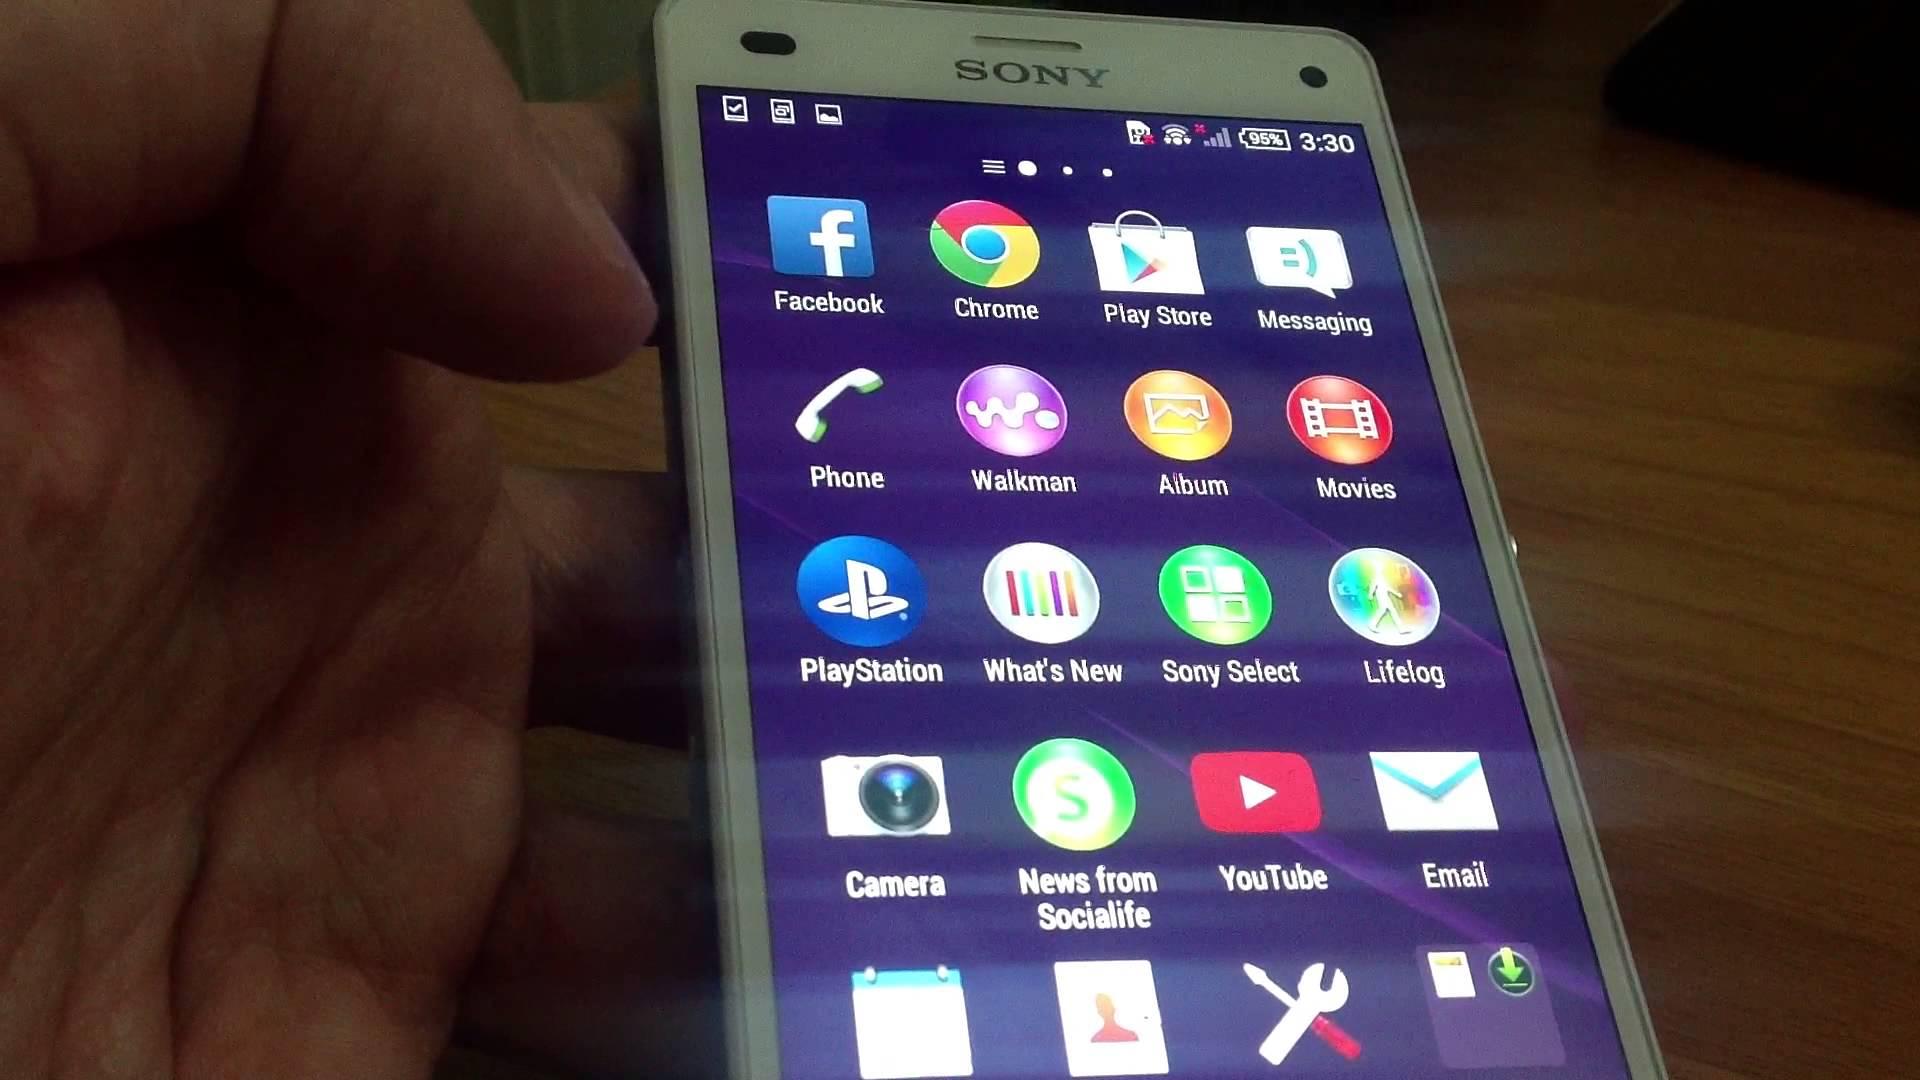 Sony xperia z3 программы скачать